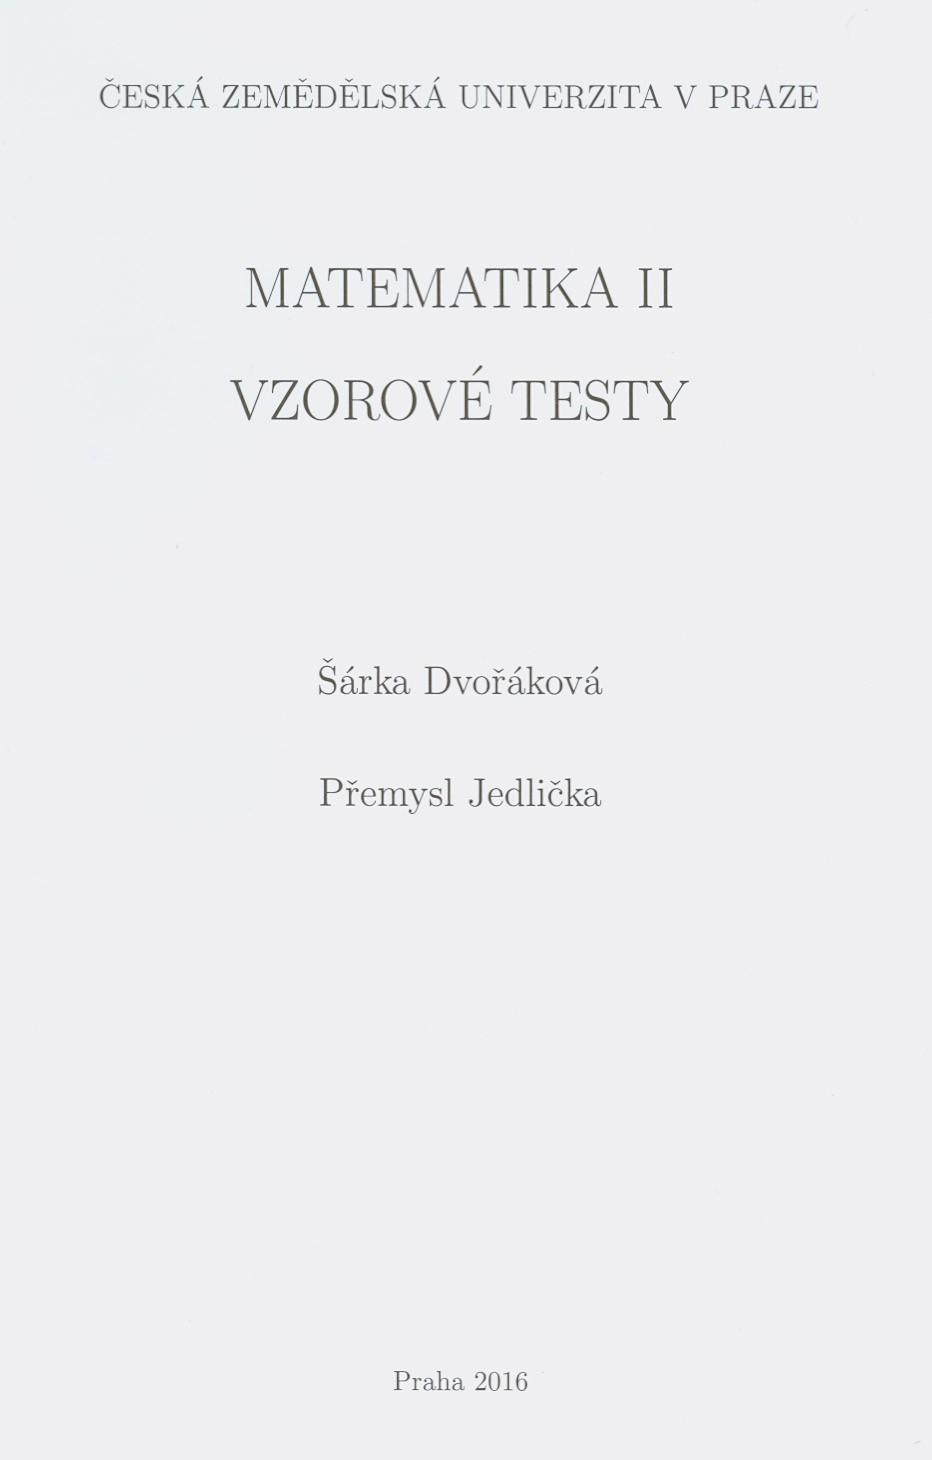 Matematika II - vzorové testy